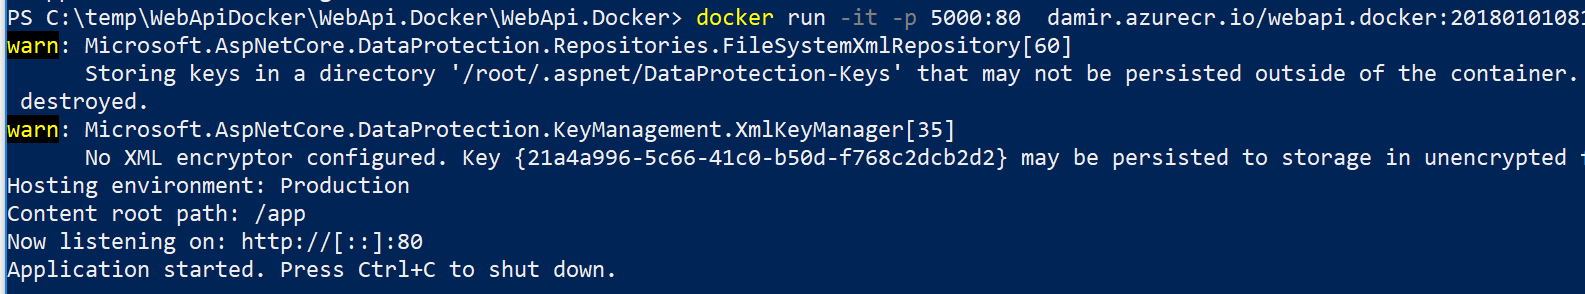 12051_Container%20registry%206